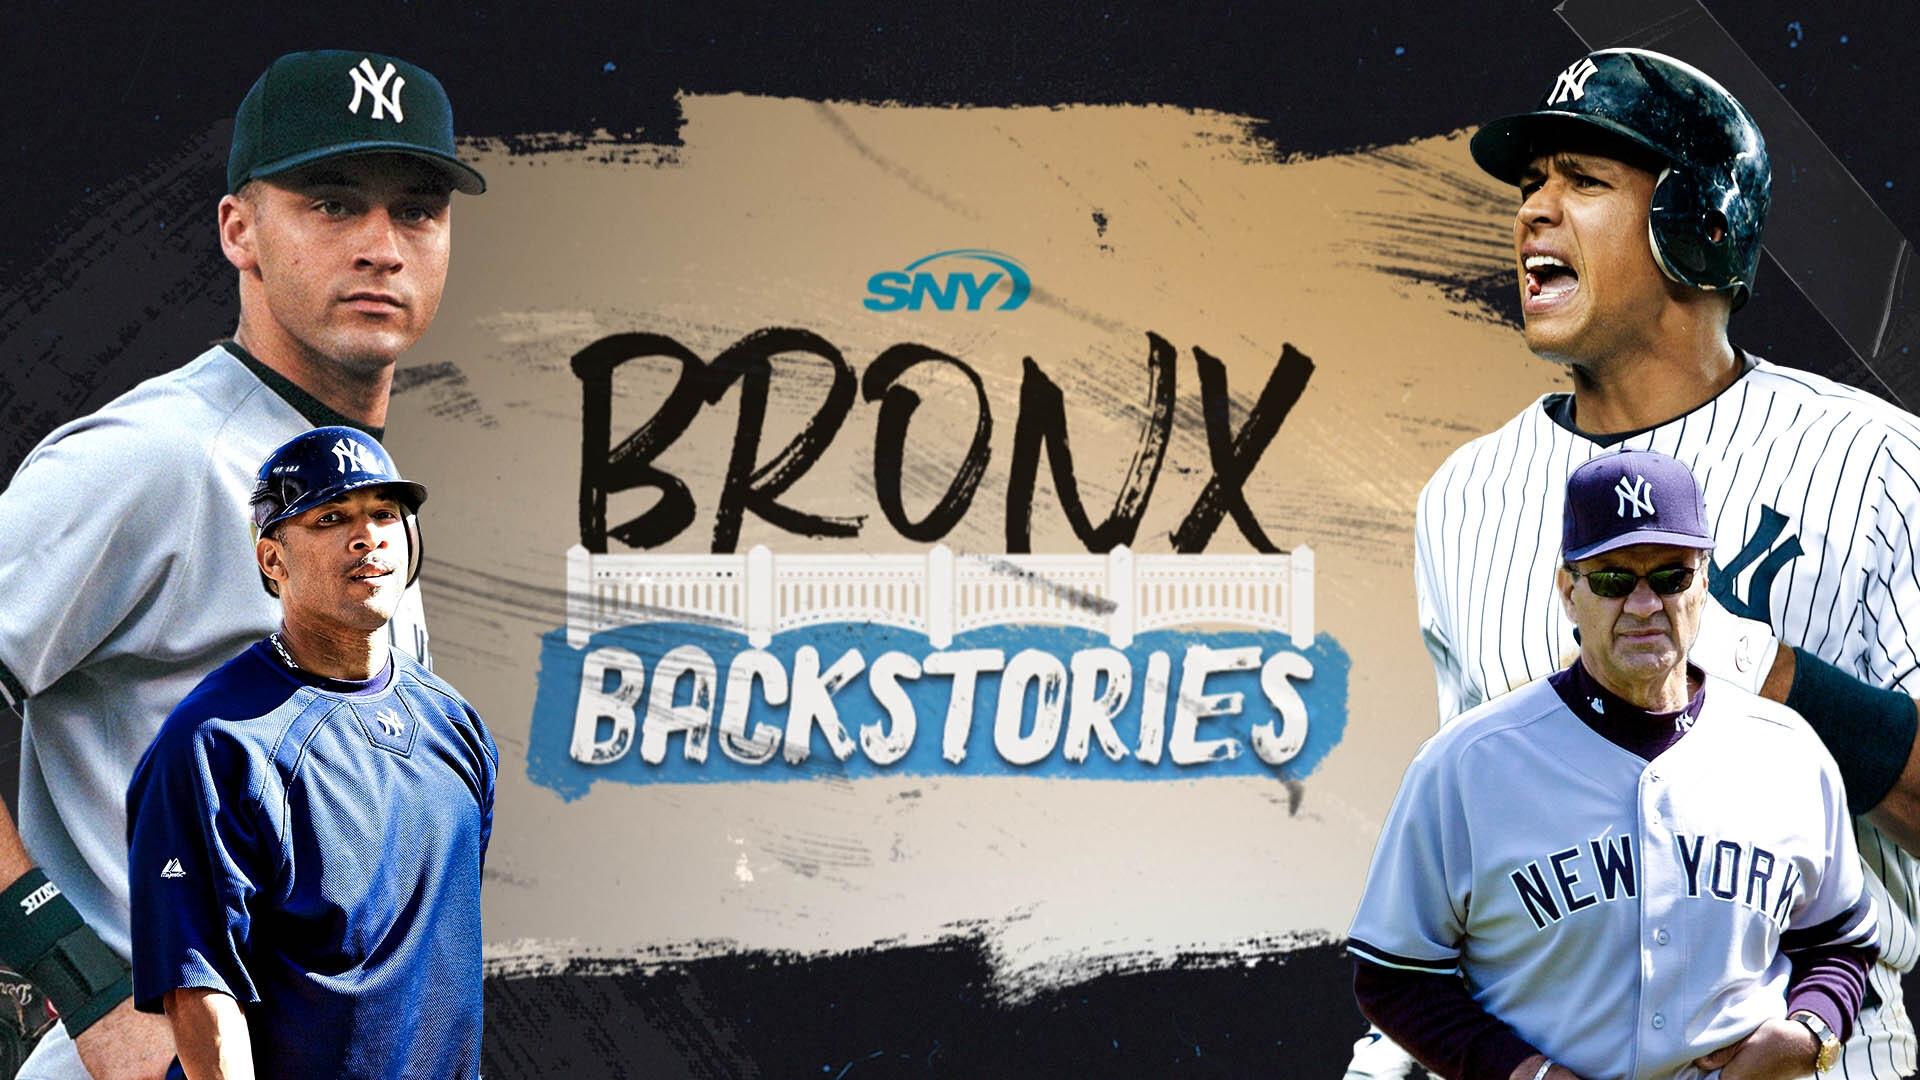 Bronx Backstories